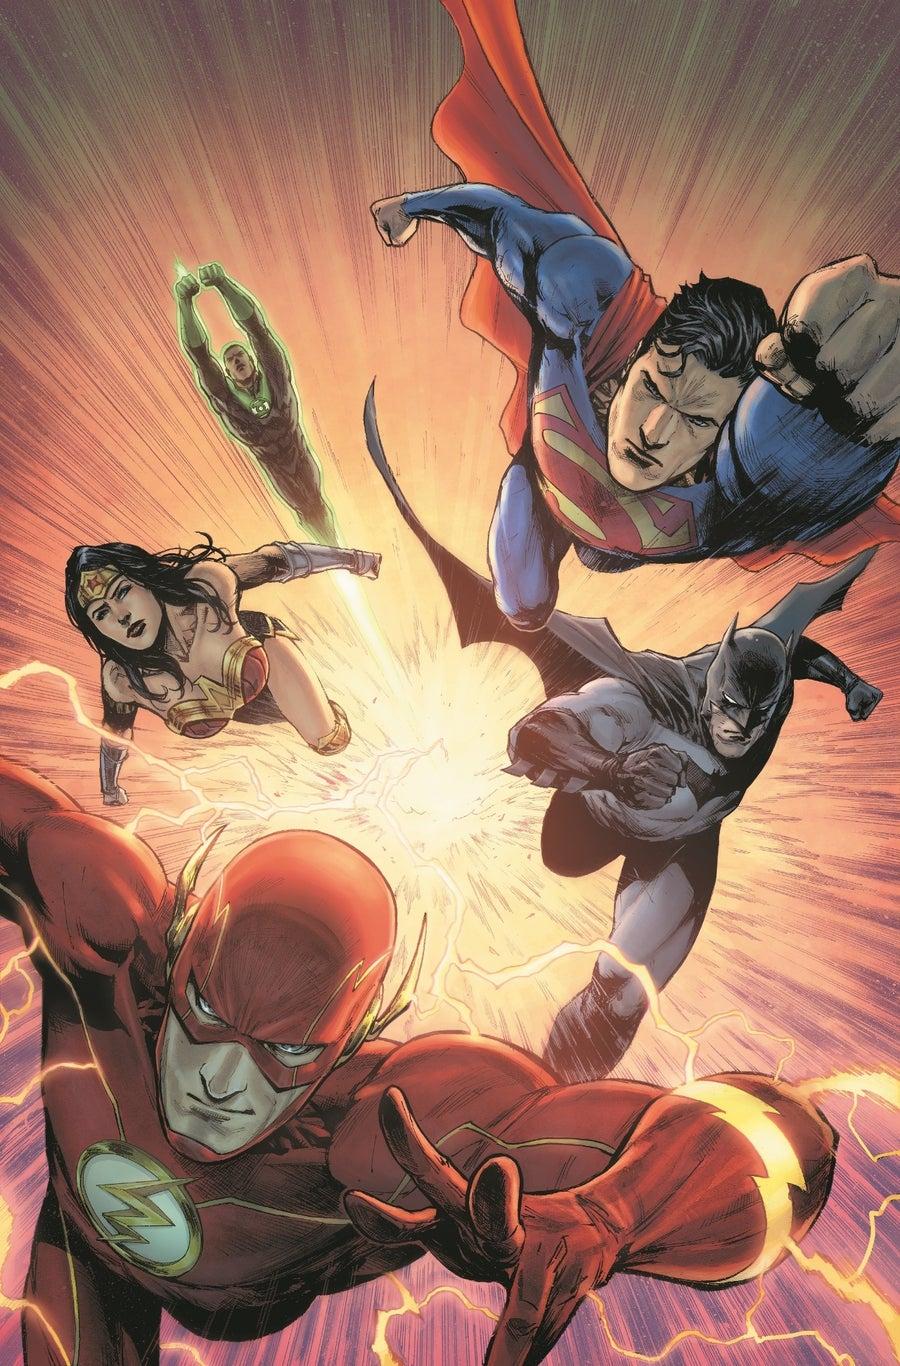 dc comics justice league last ride 1 variant